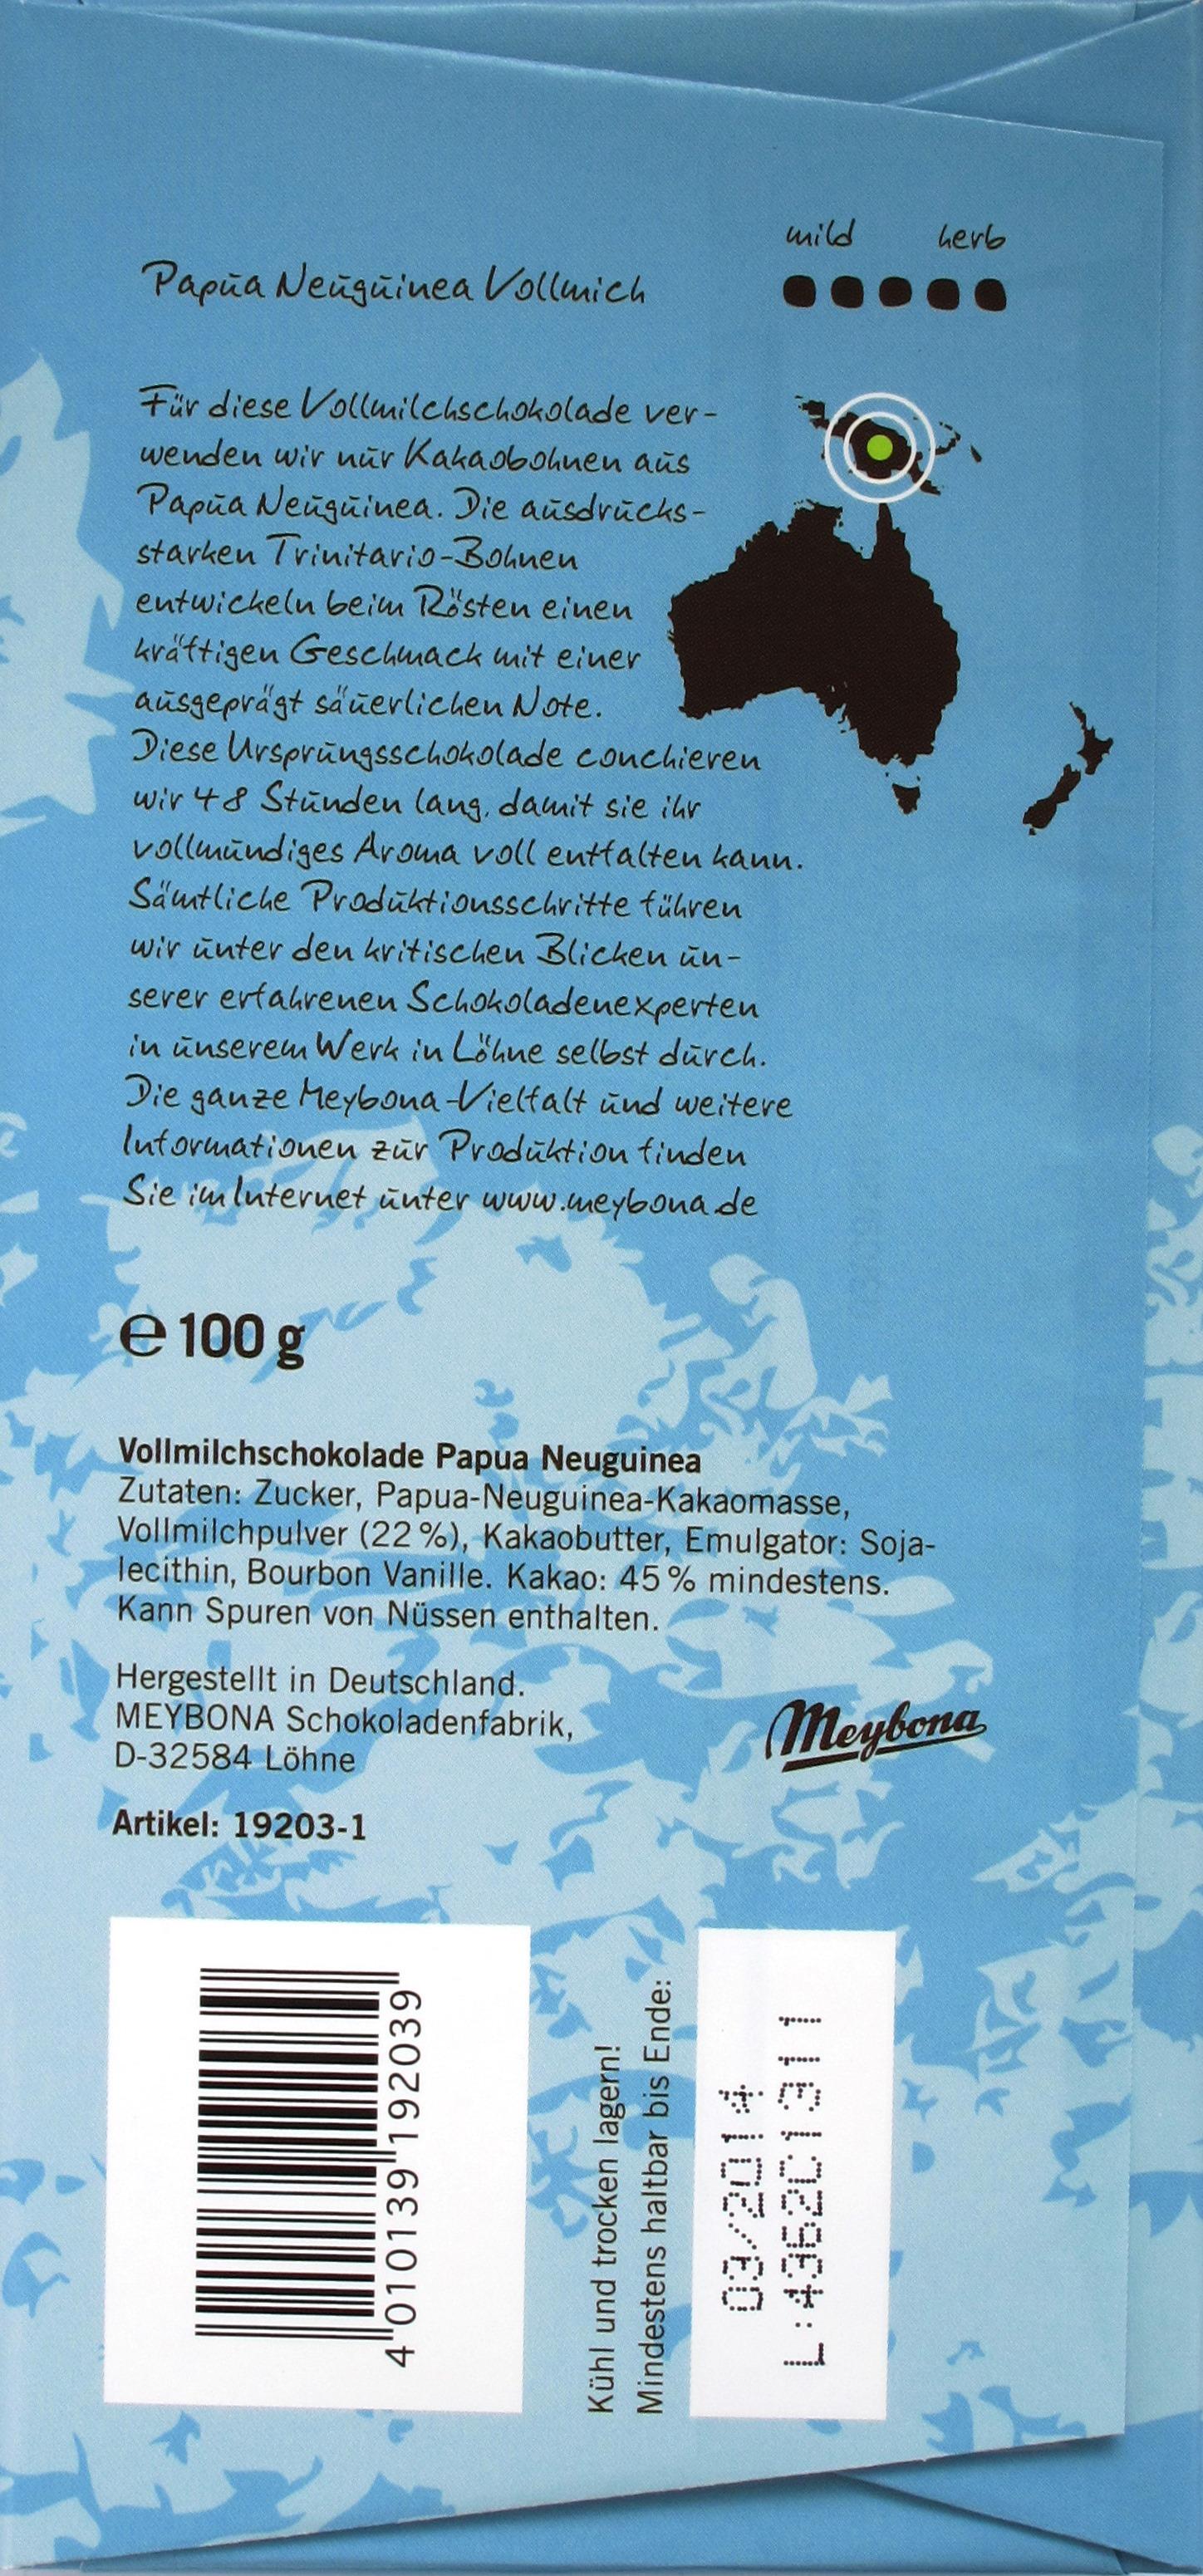 Meybona Papua Neuguinea Vollmilchschokolade, Rückseite